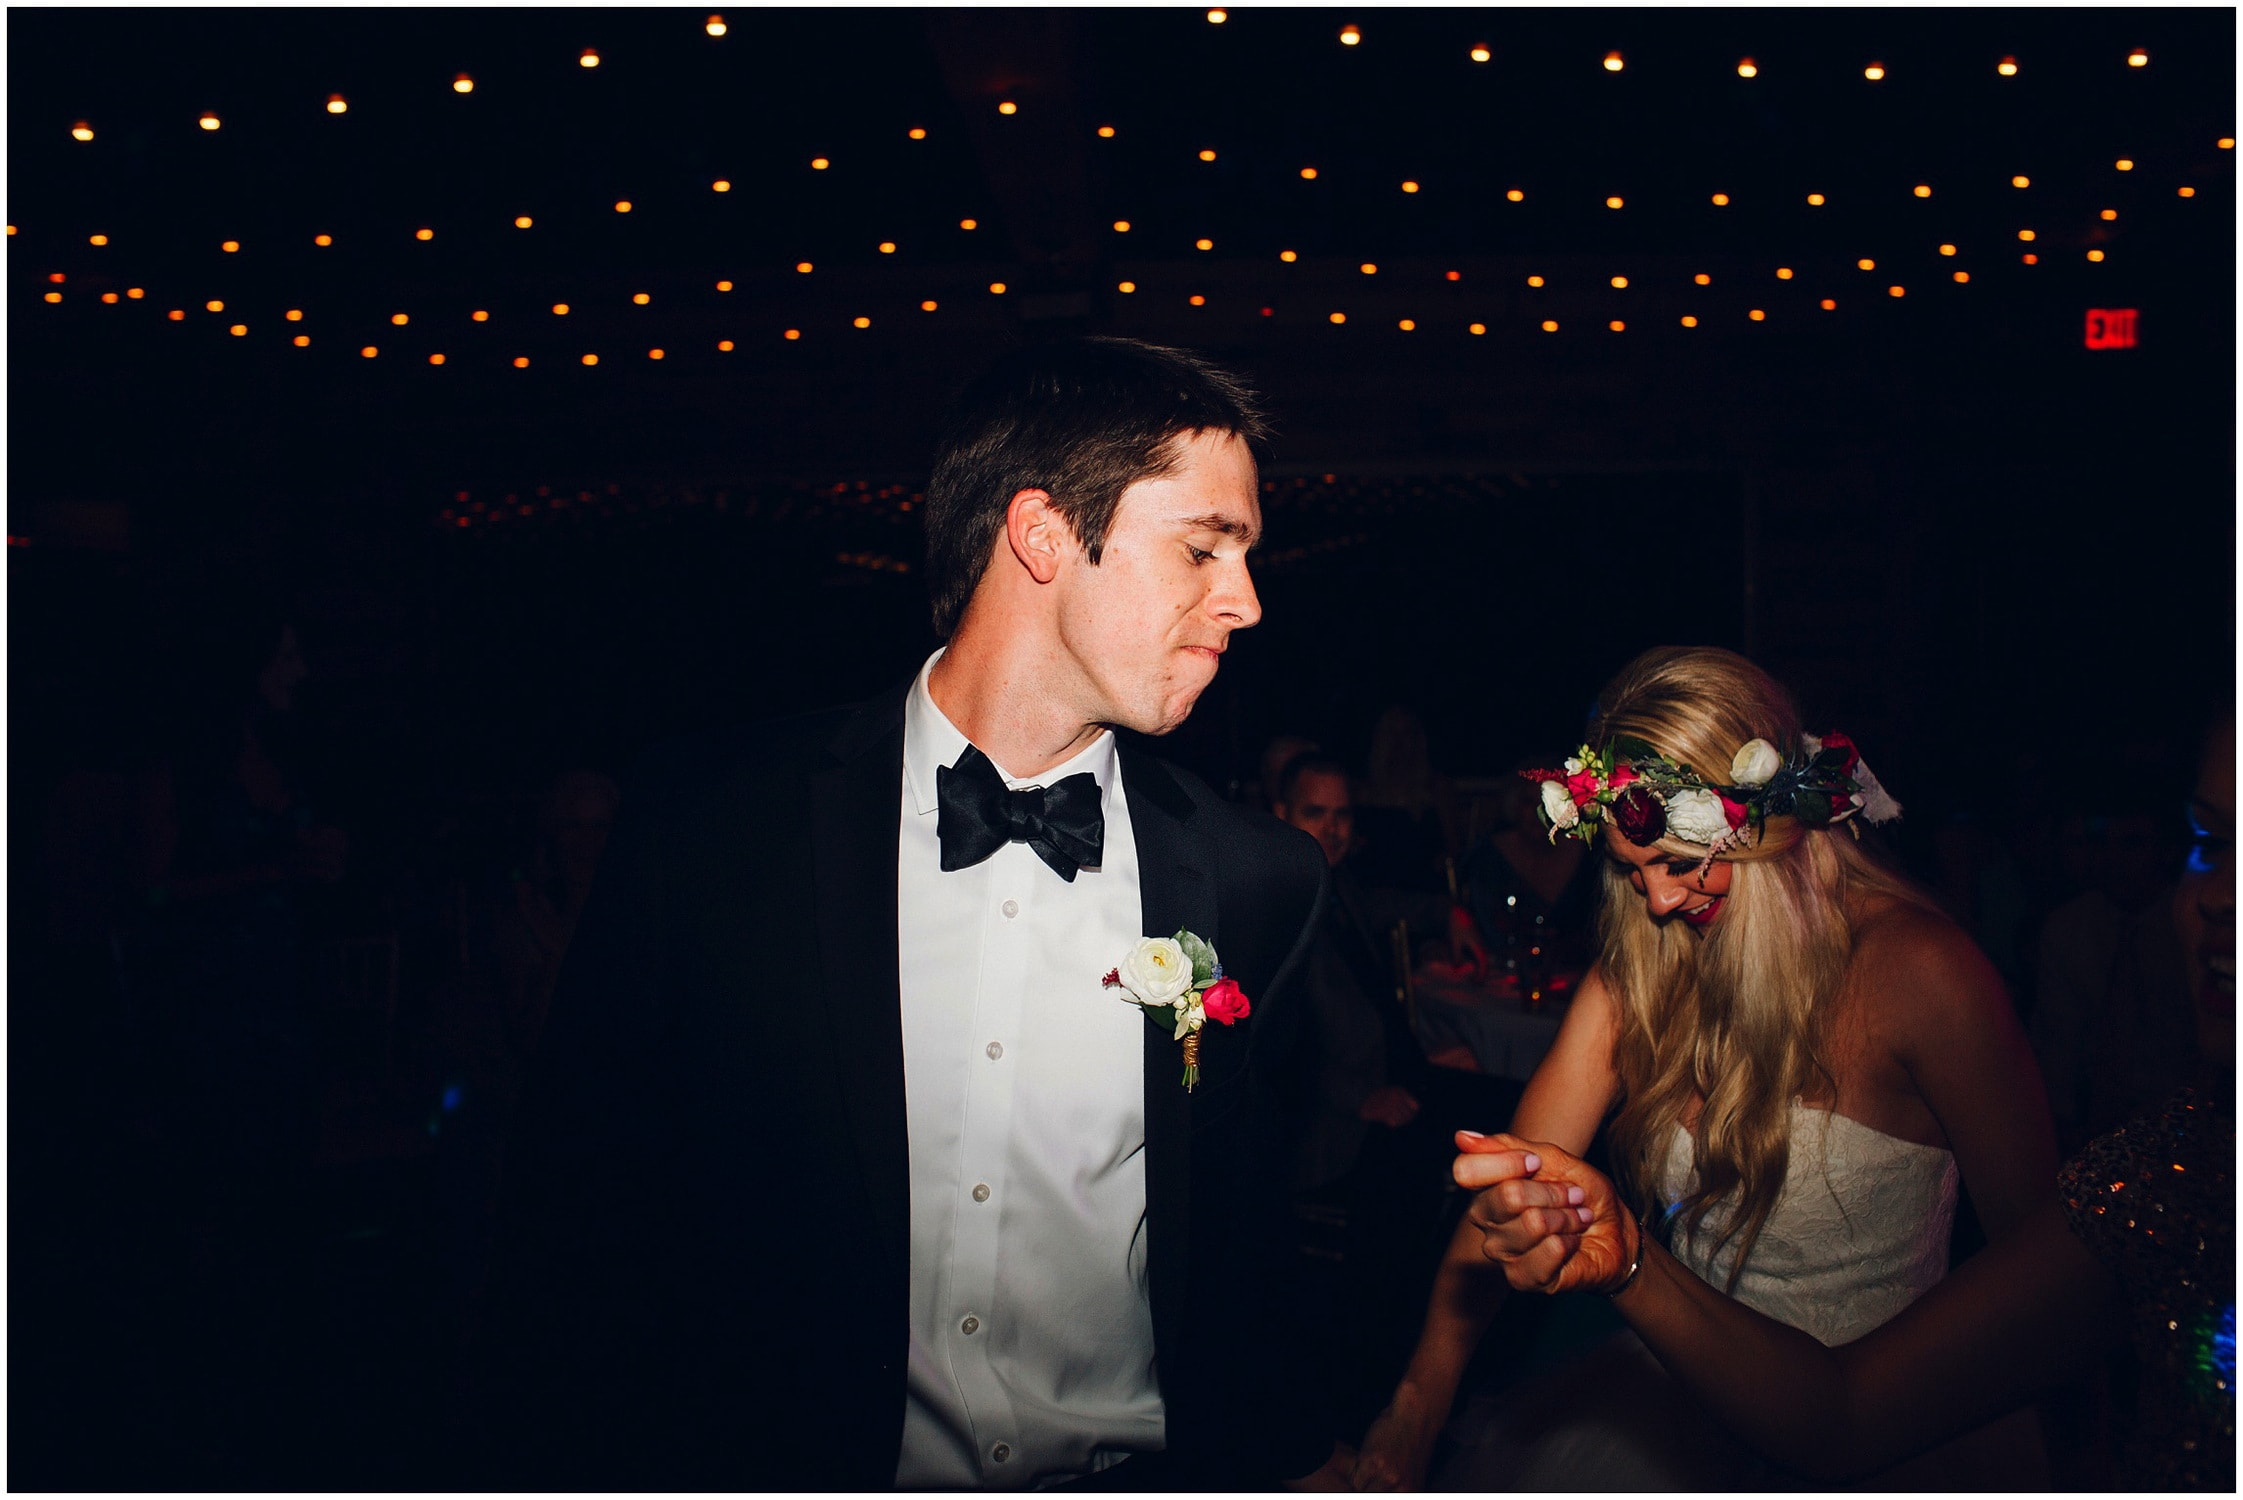 southwindhills_oklahoma_wedding1024_blogstomped